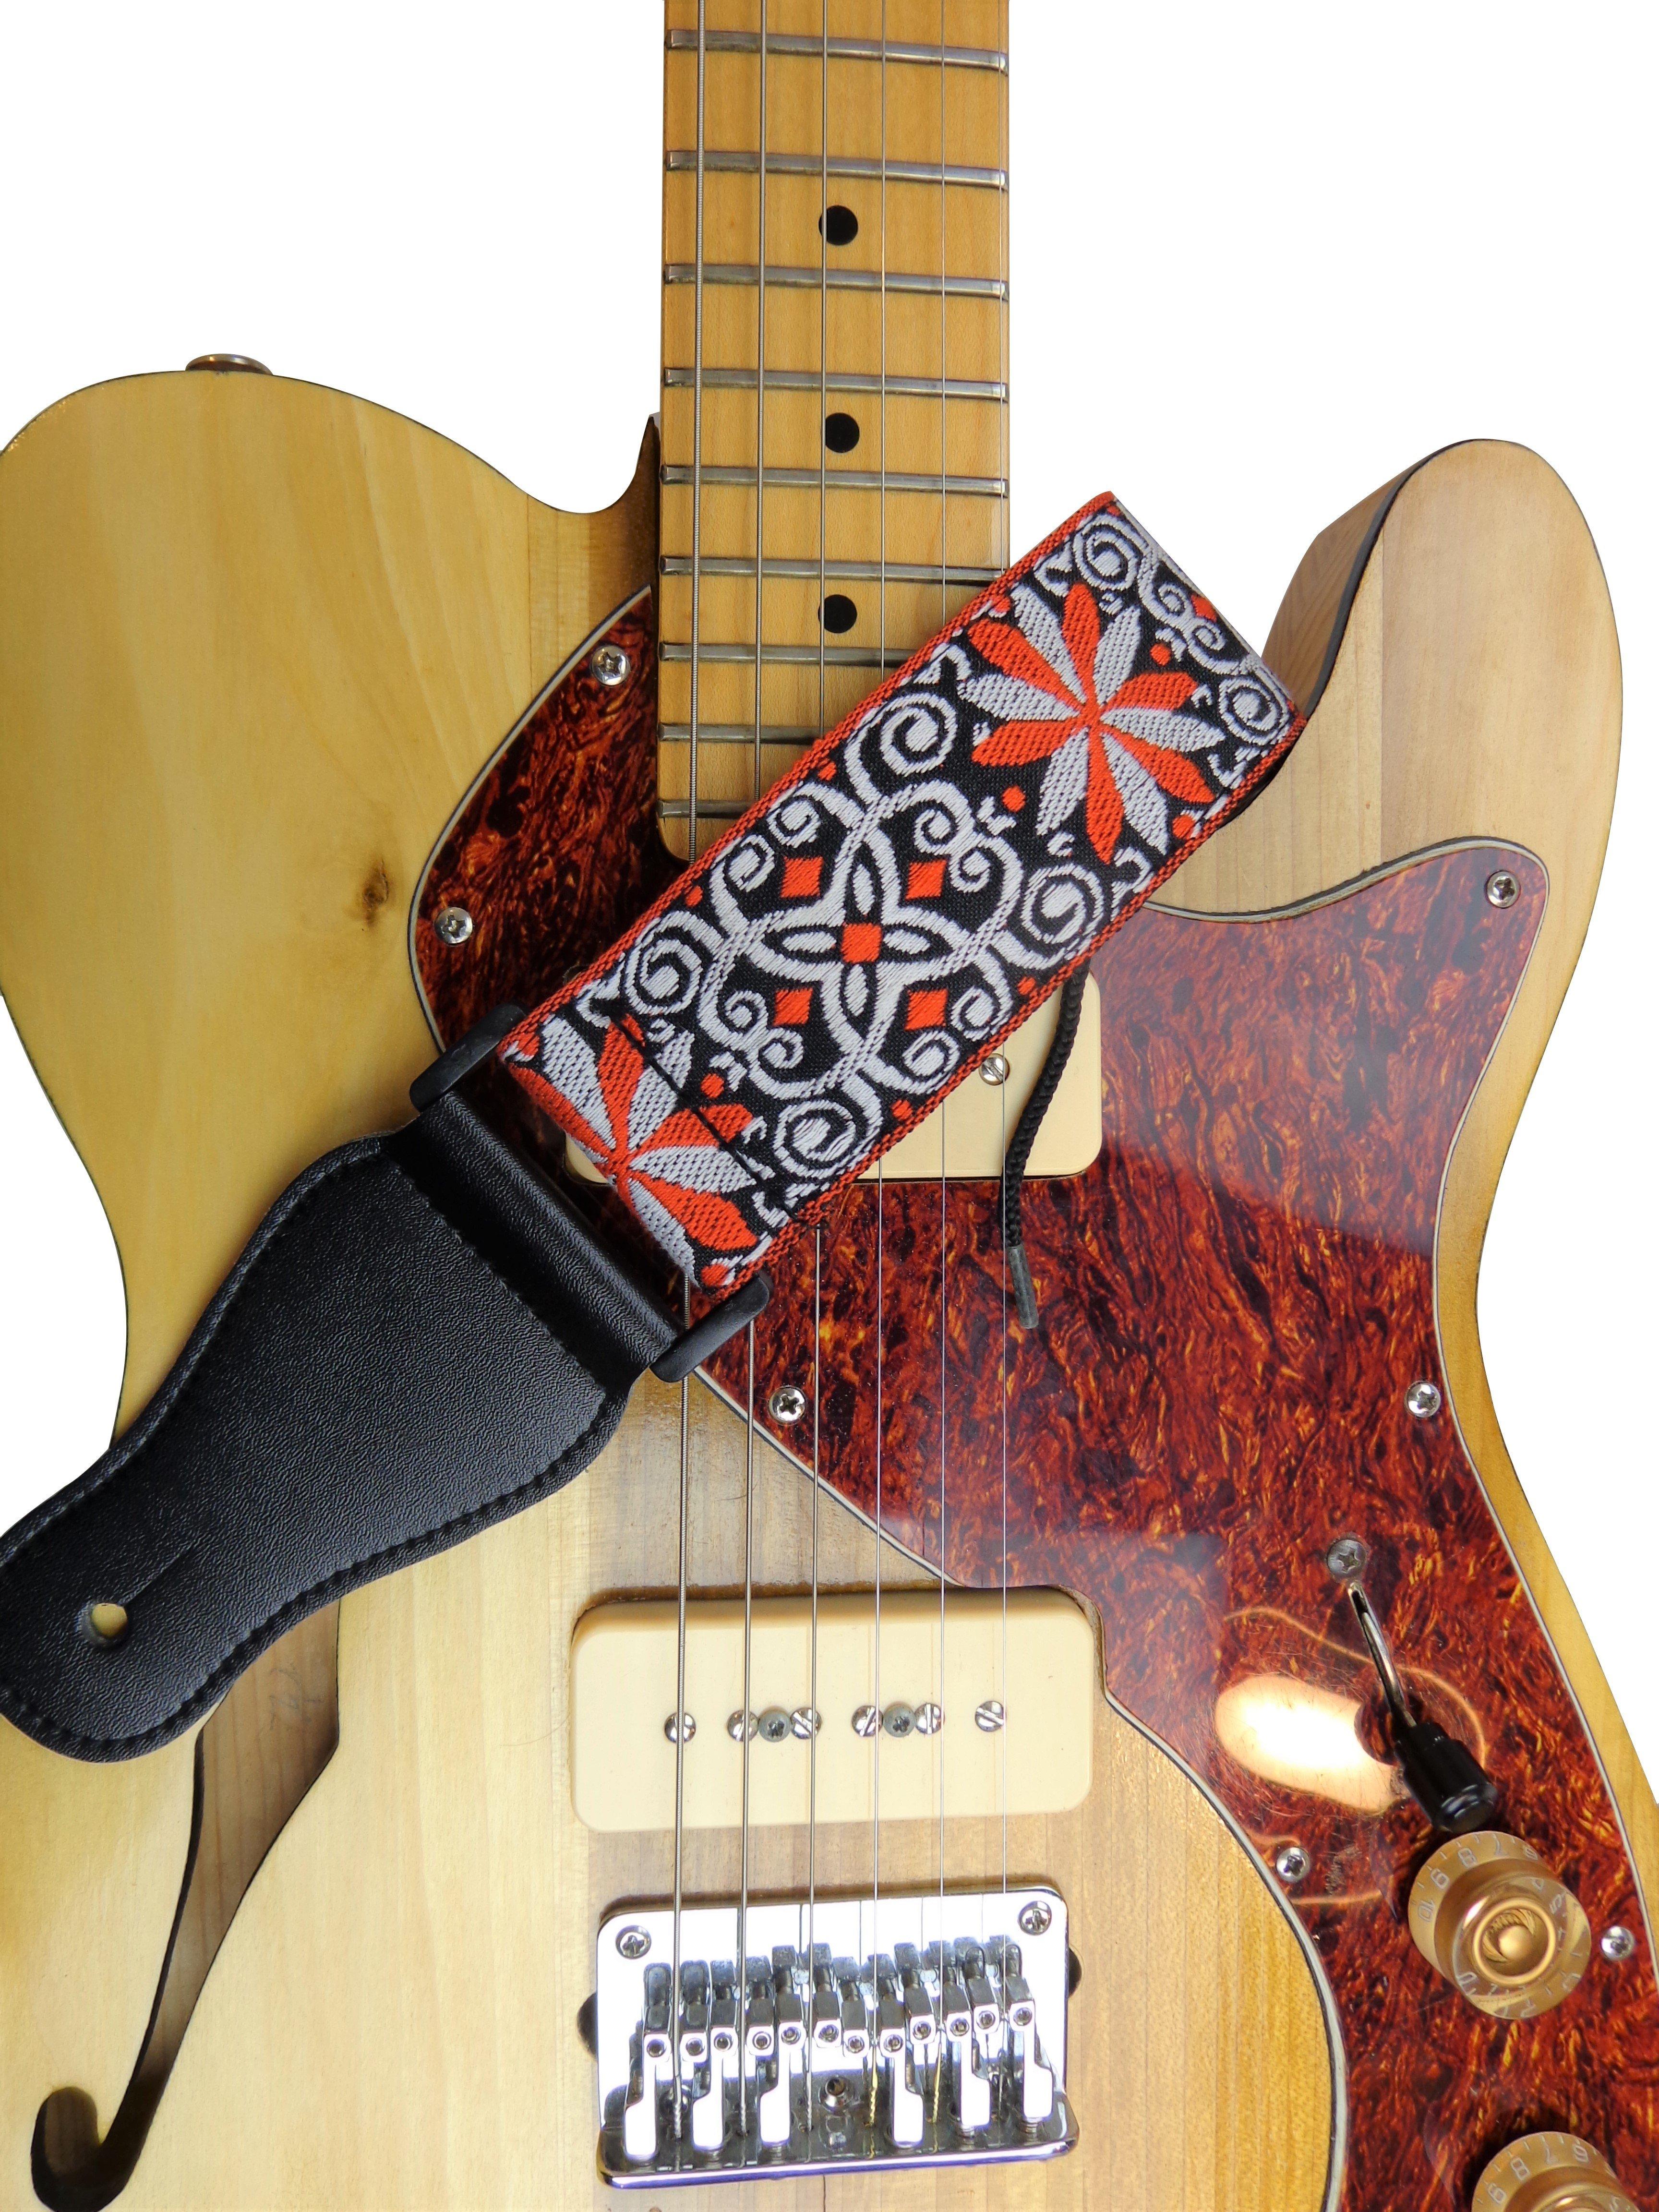 New-Retro-Vintage-Jacquard-Woven-Acoustic-Electric-Guitar-Strap thumbnail 46